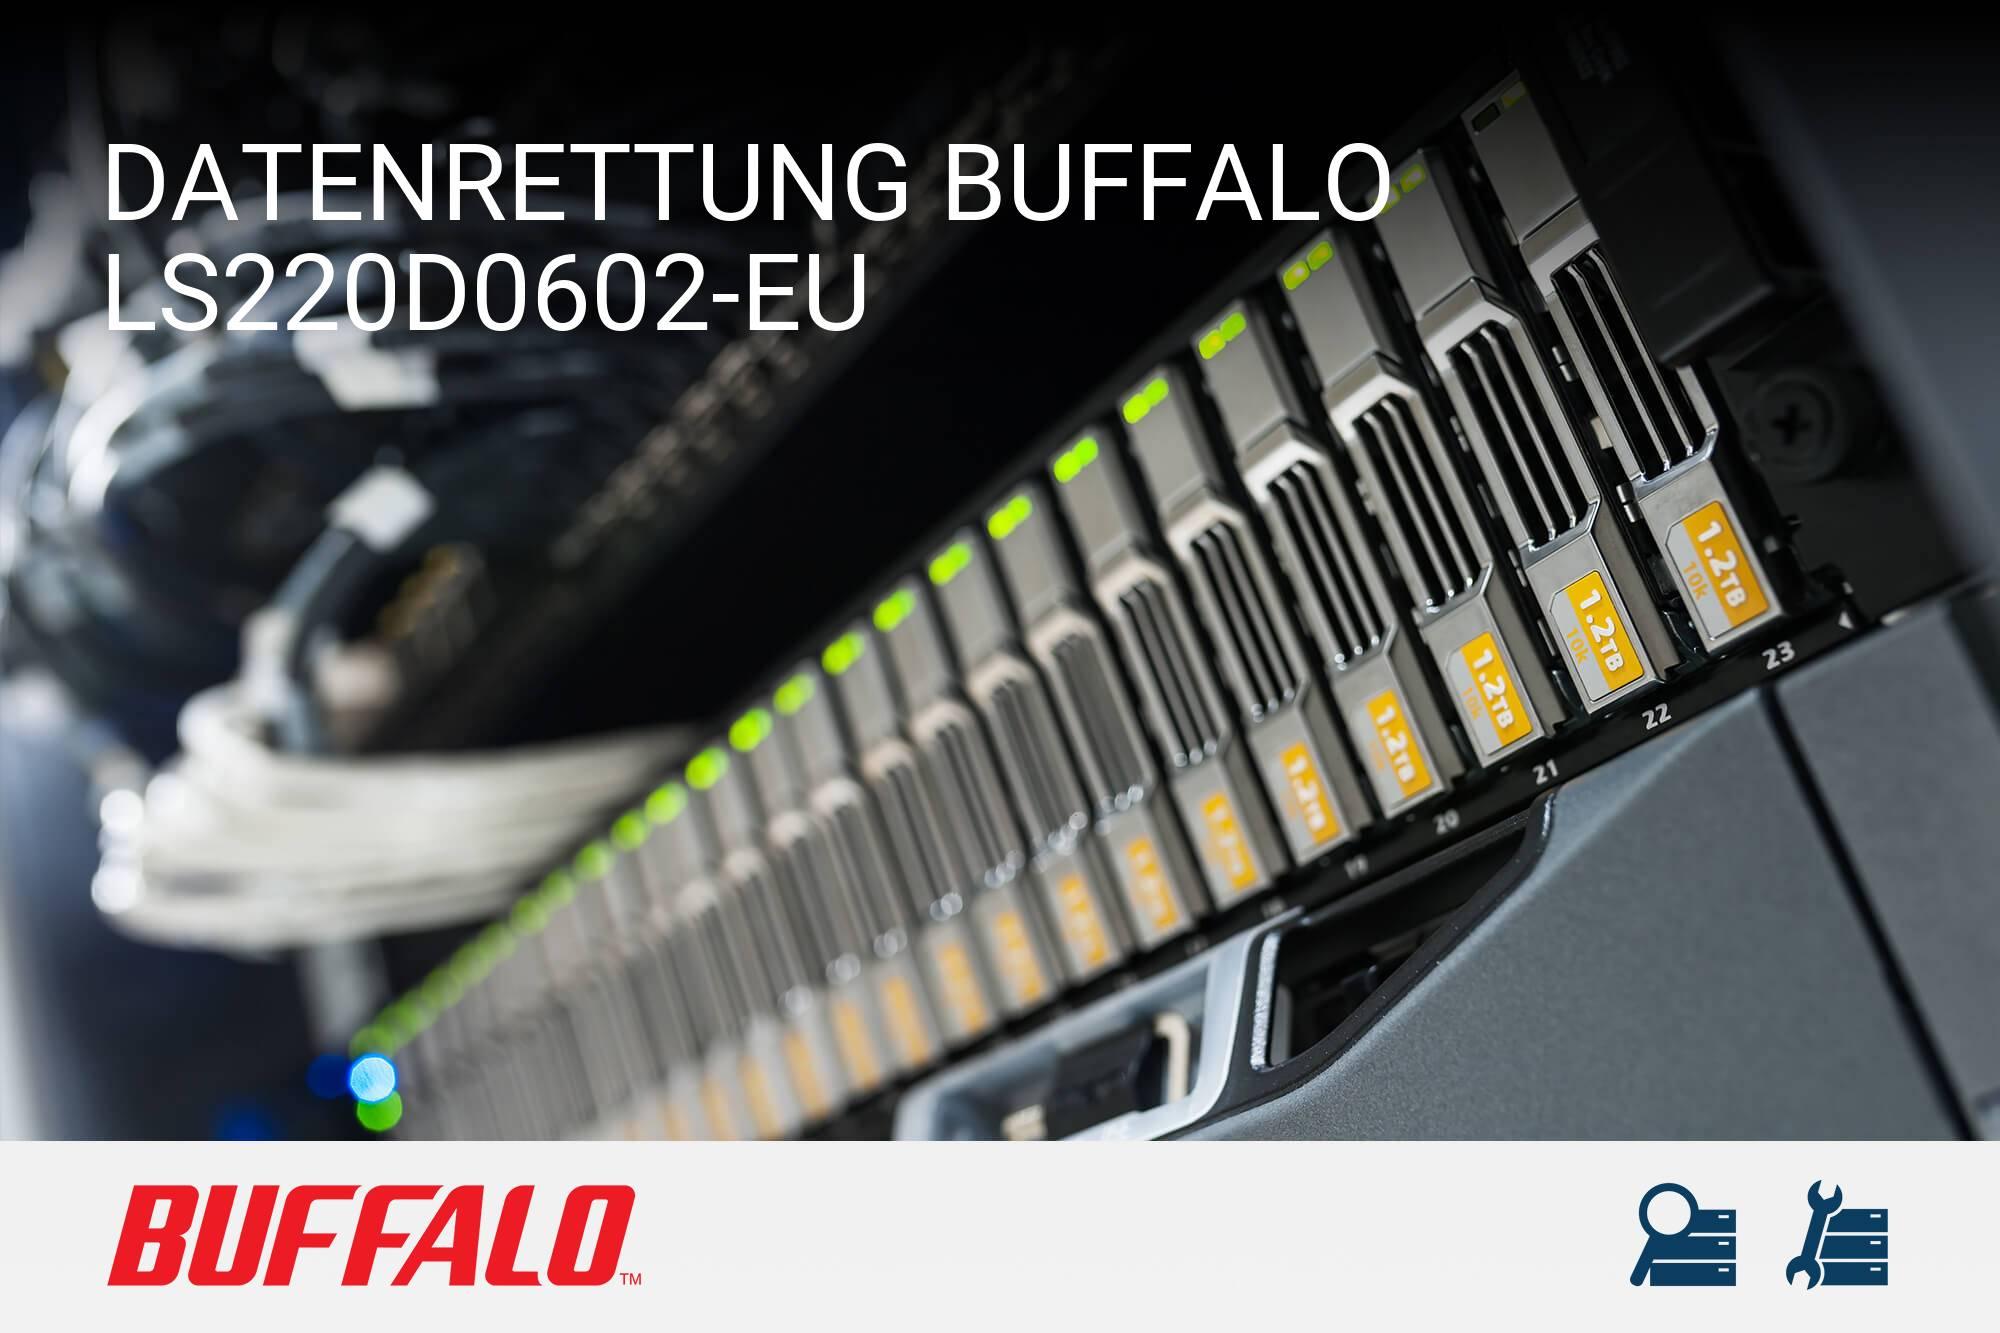 Buffalo LS220D0602-EU